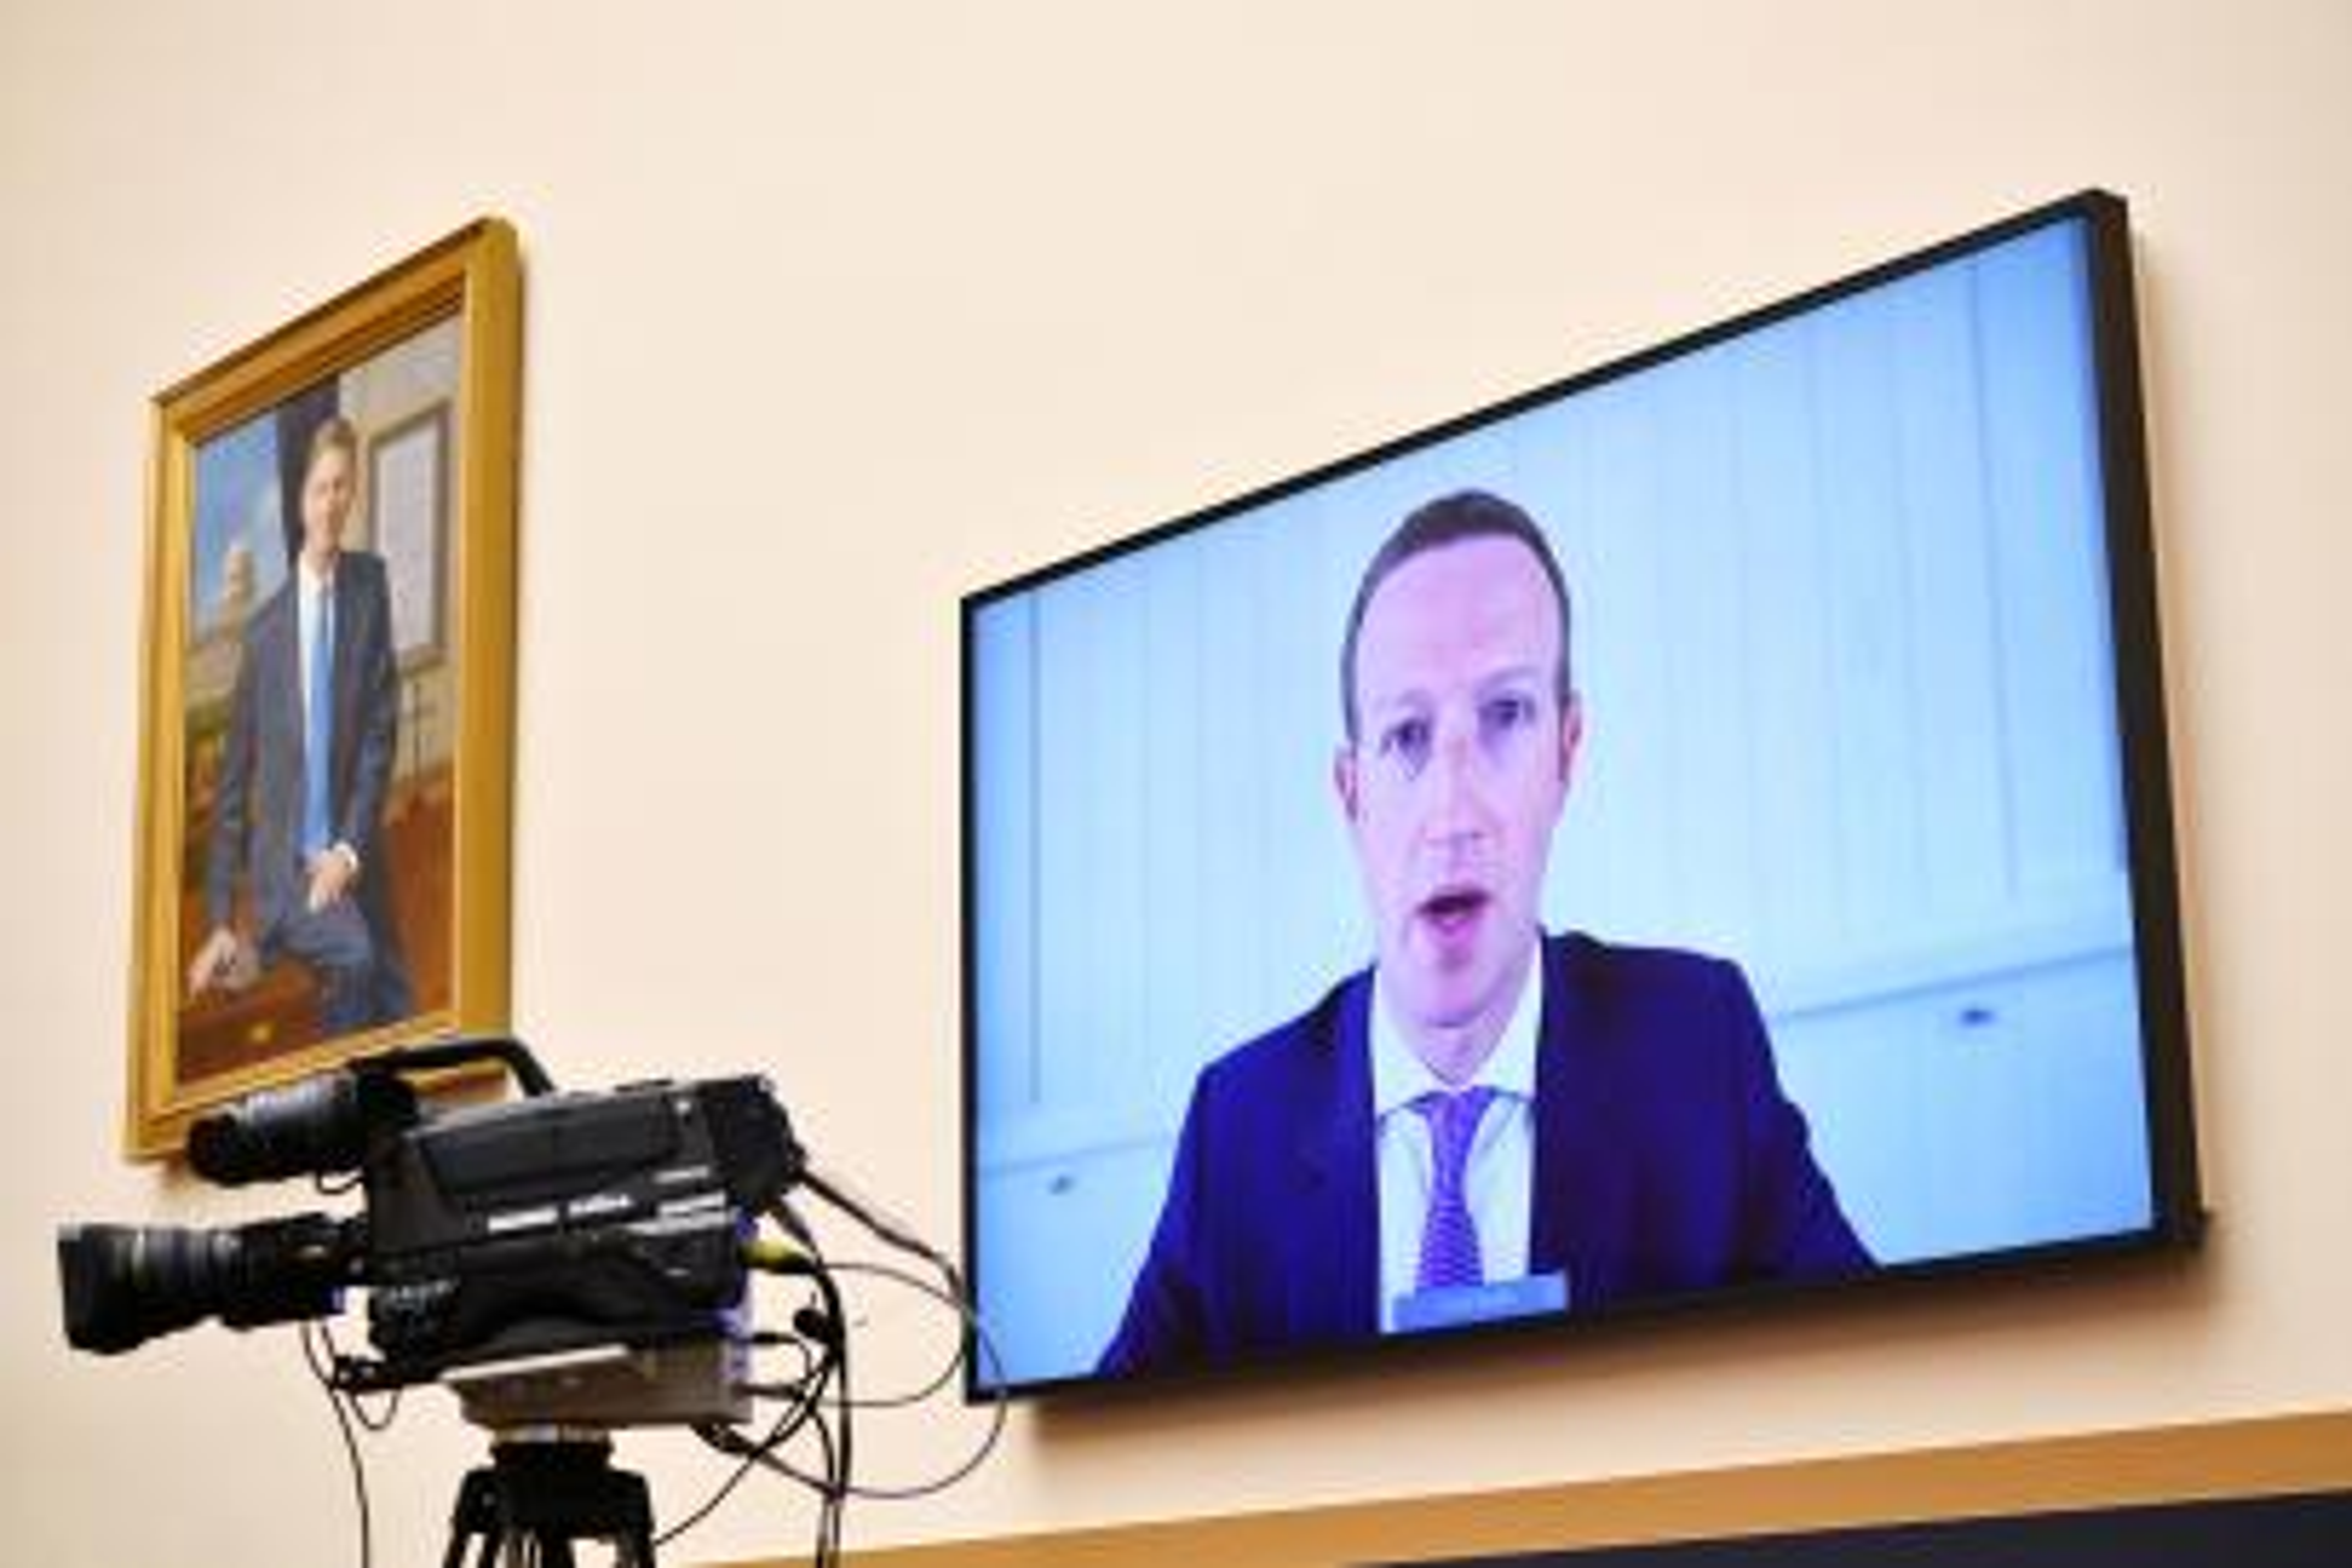 Mark Zuckerberg testifying over video.